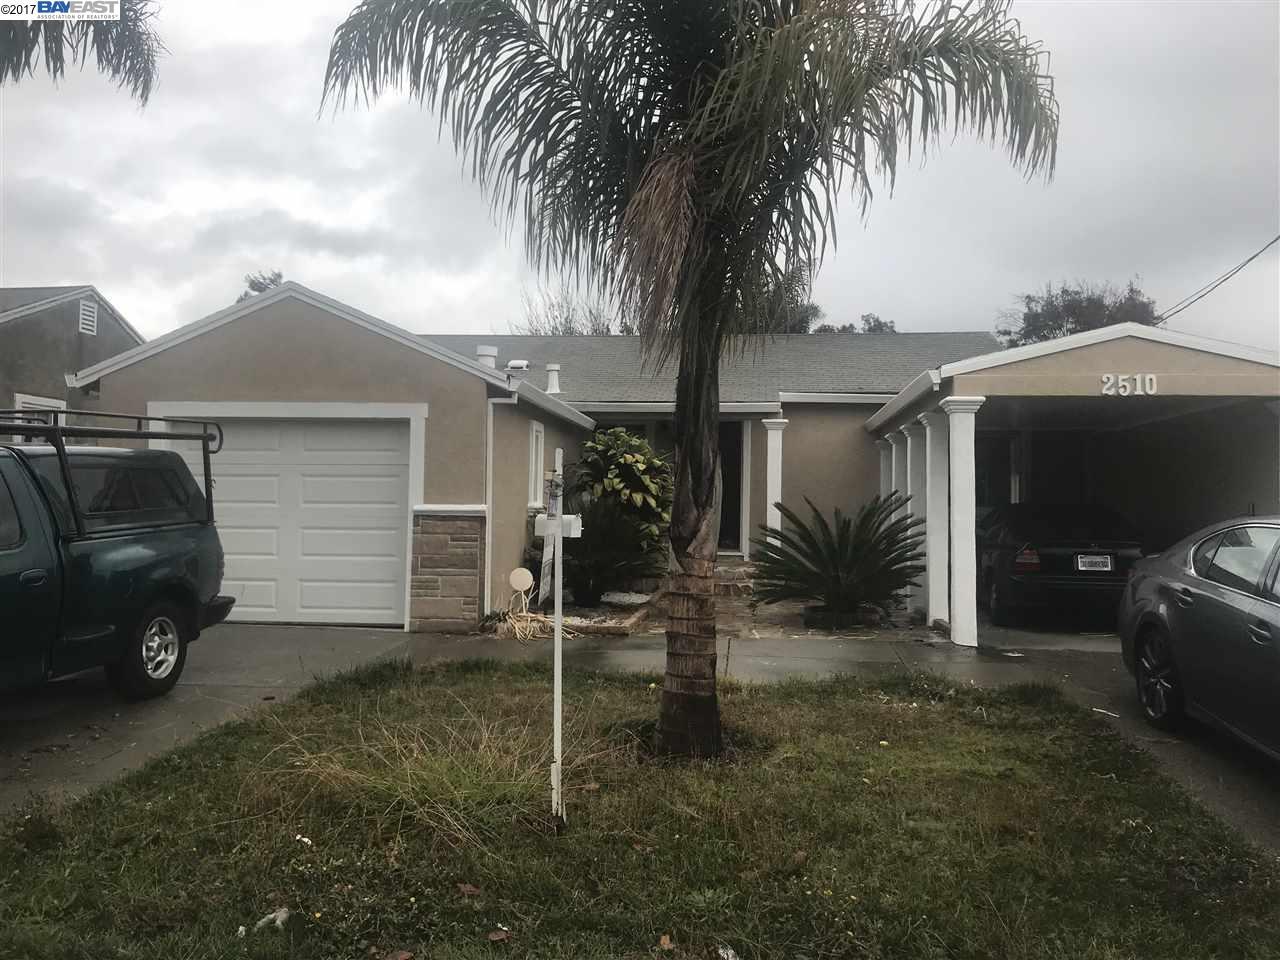 واحد منزل الأسرة للـ Sale في 2510 Macarthur Avenue 2510 Macarthur Avenue San Pablo, California 94806 United States